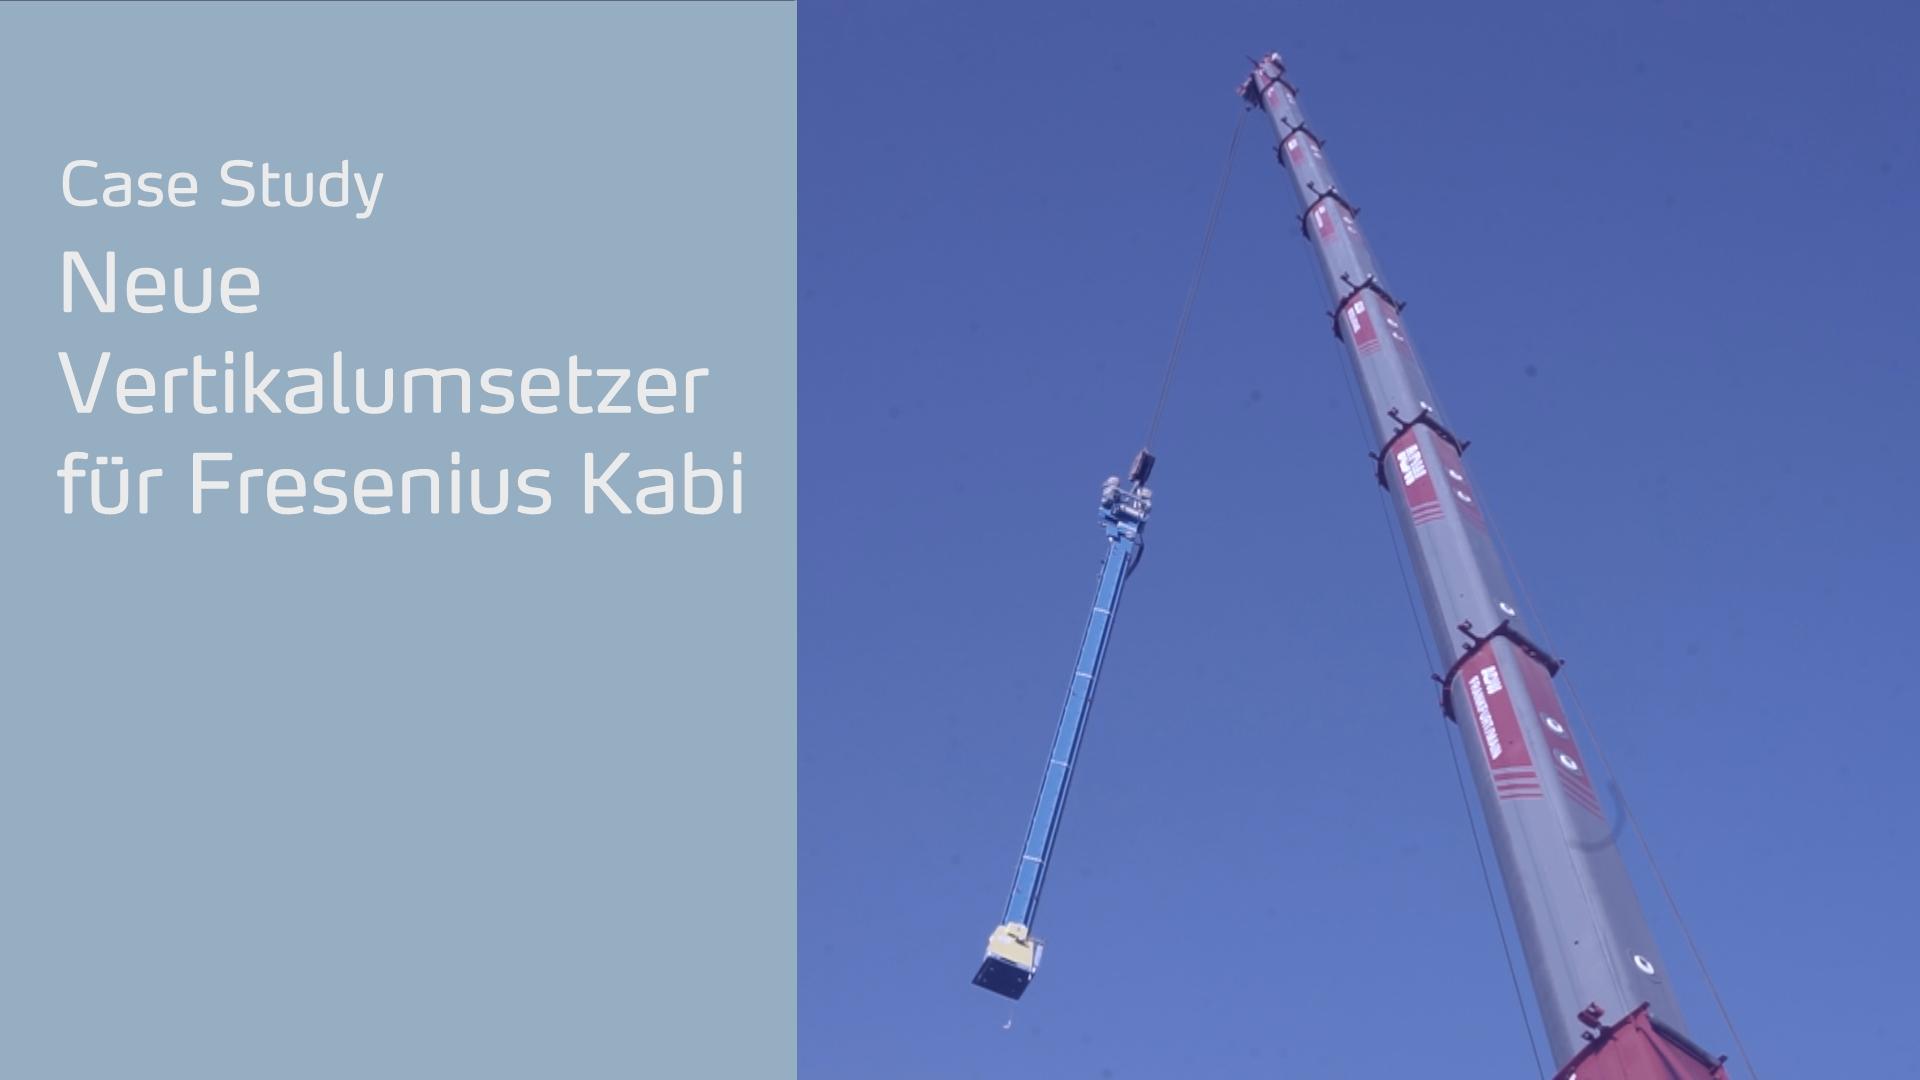 Video_Case_Study_Fresenius_Modernisierung_DE